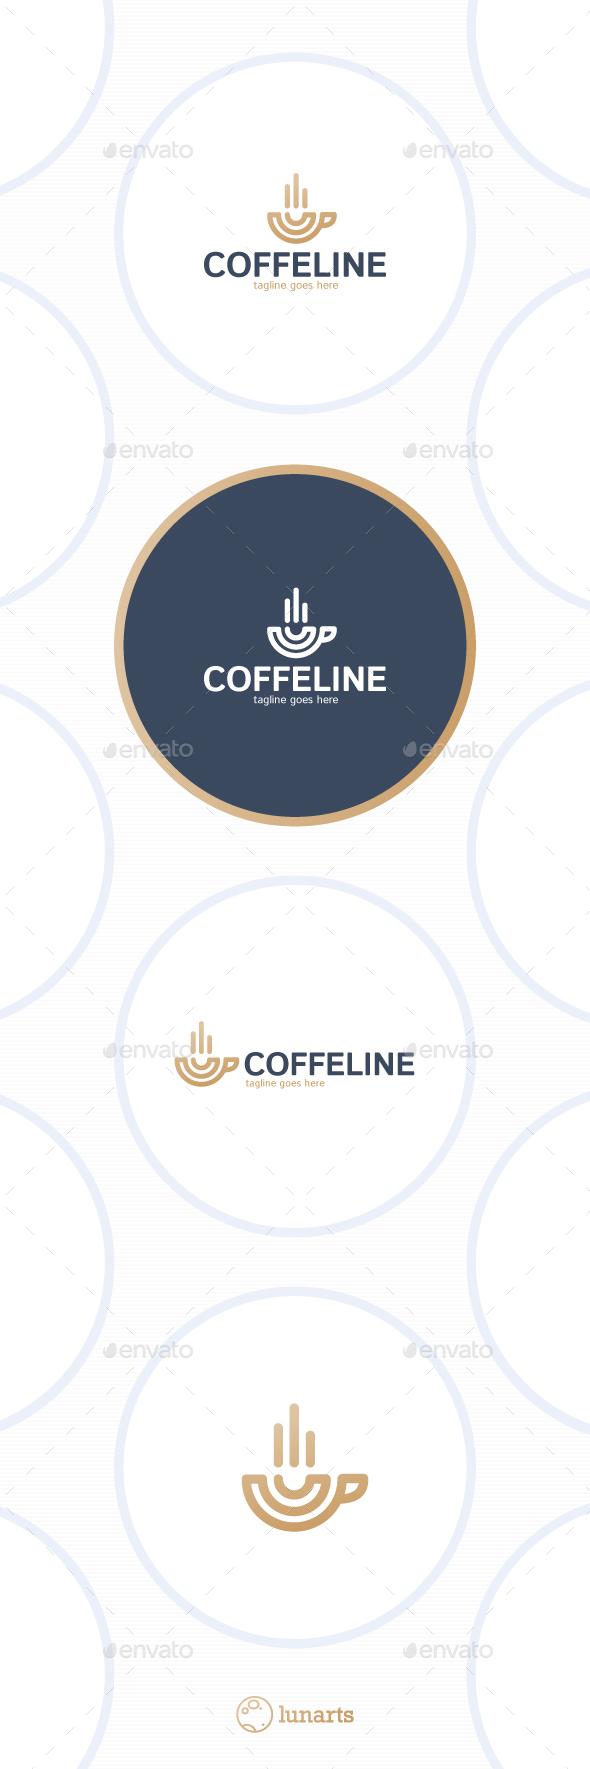 Coffe Logo - Line Cup